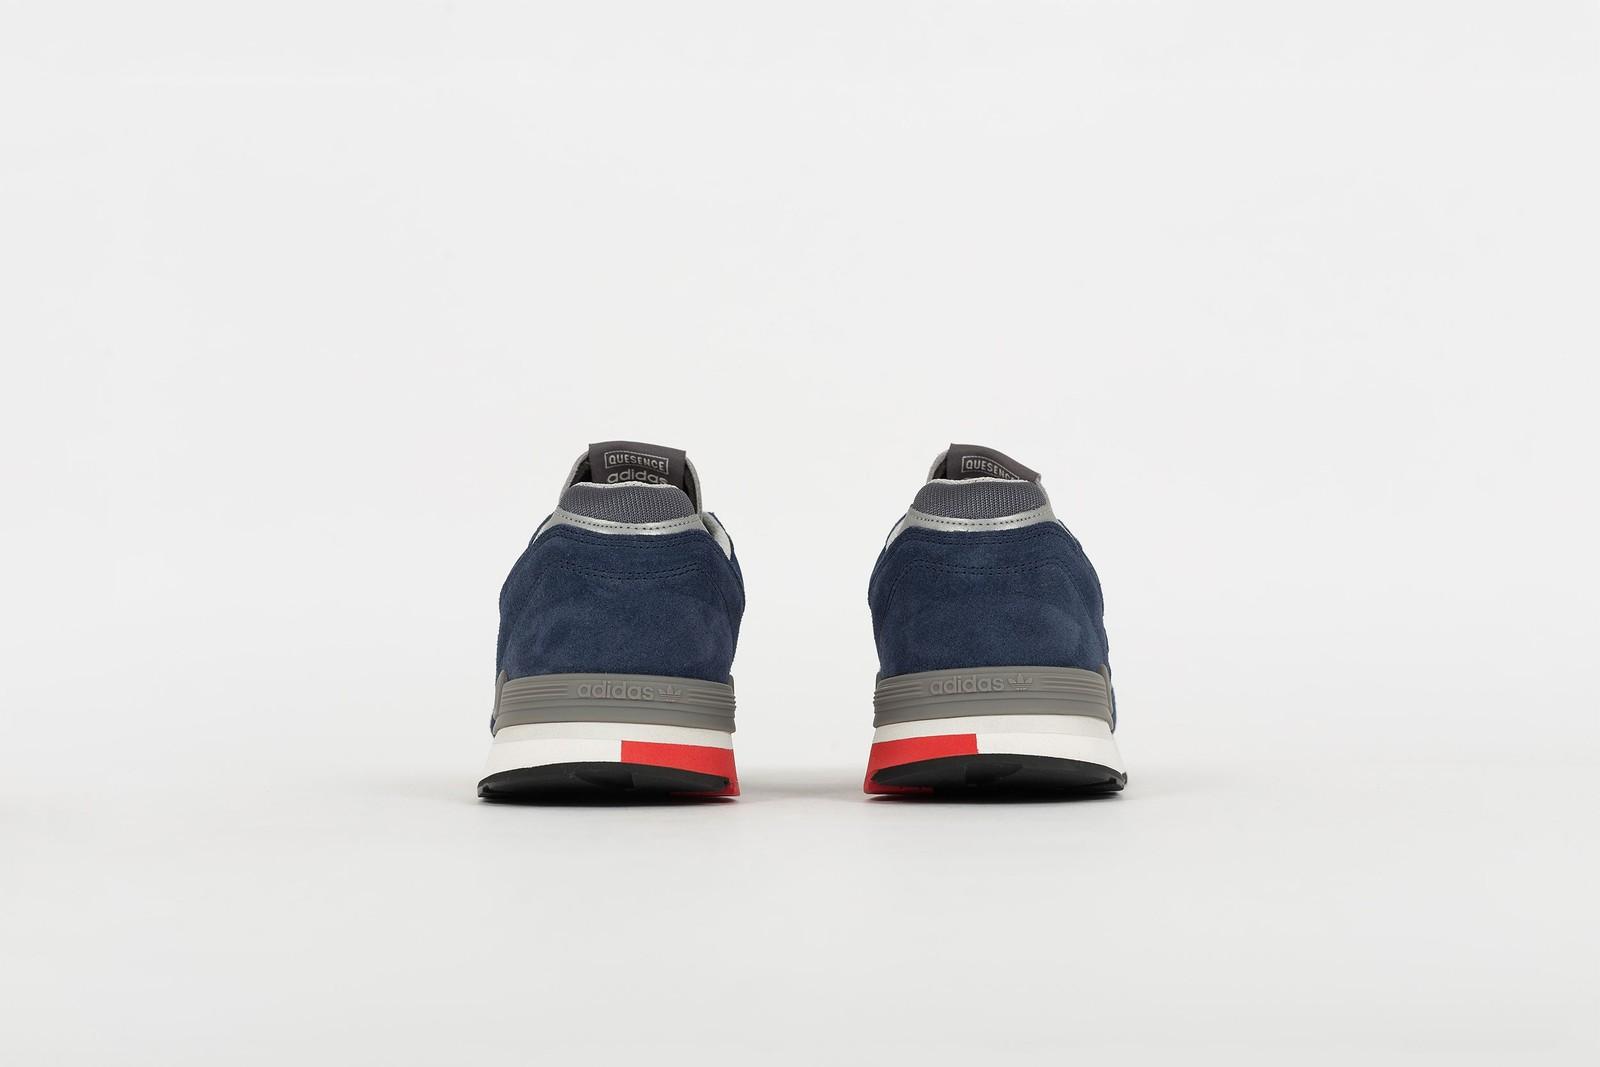 Adidas quesence taglia 11 uomini cq2130 e 50 oggetti simili